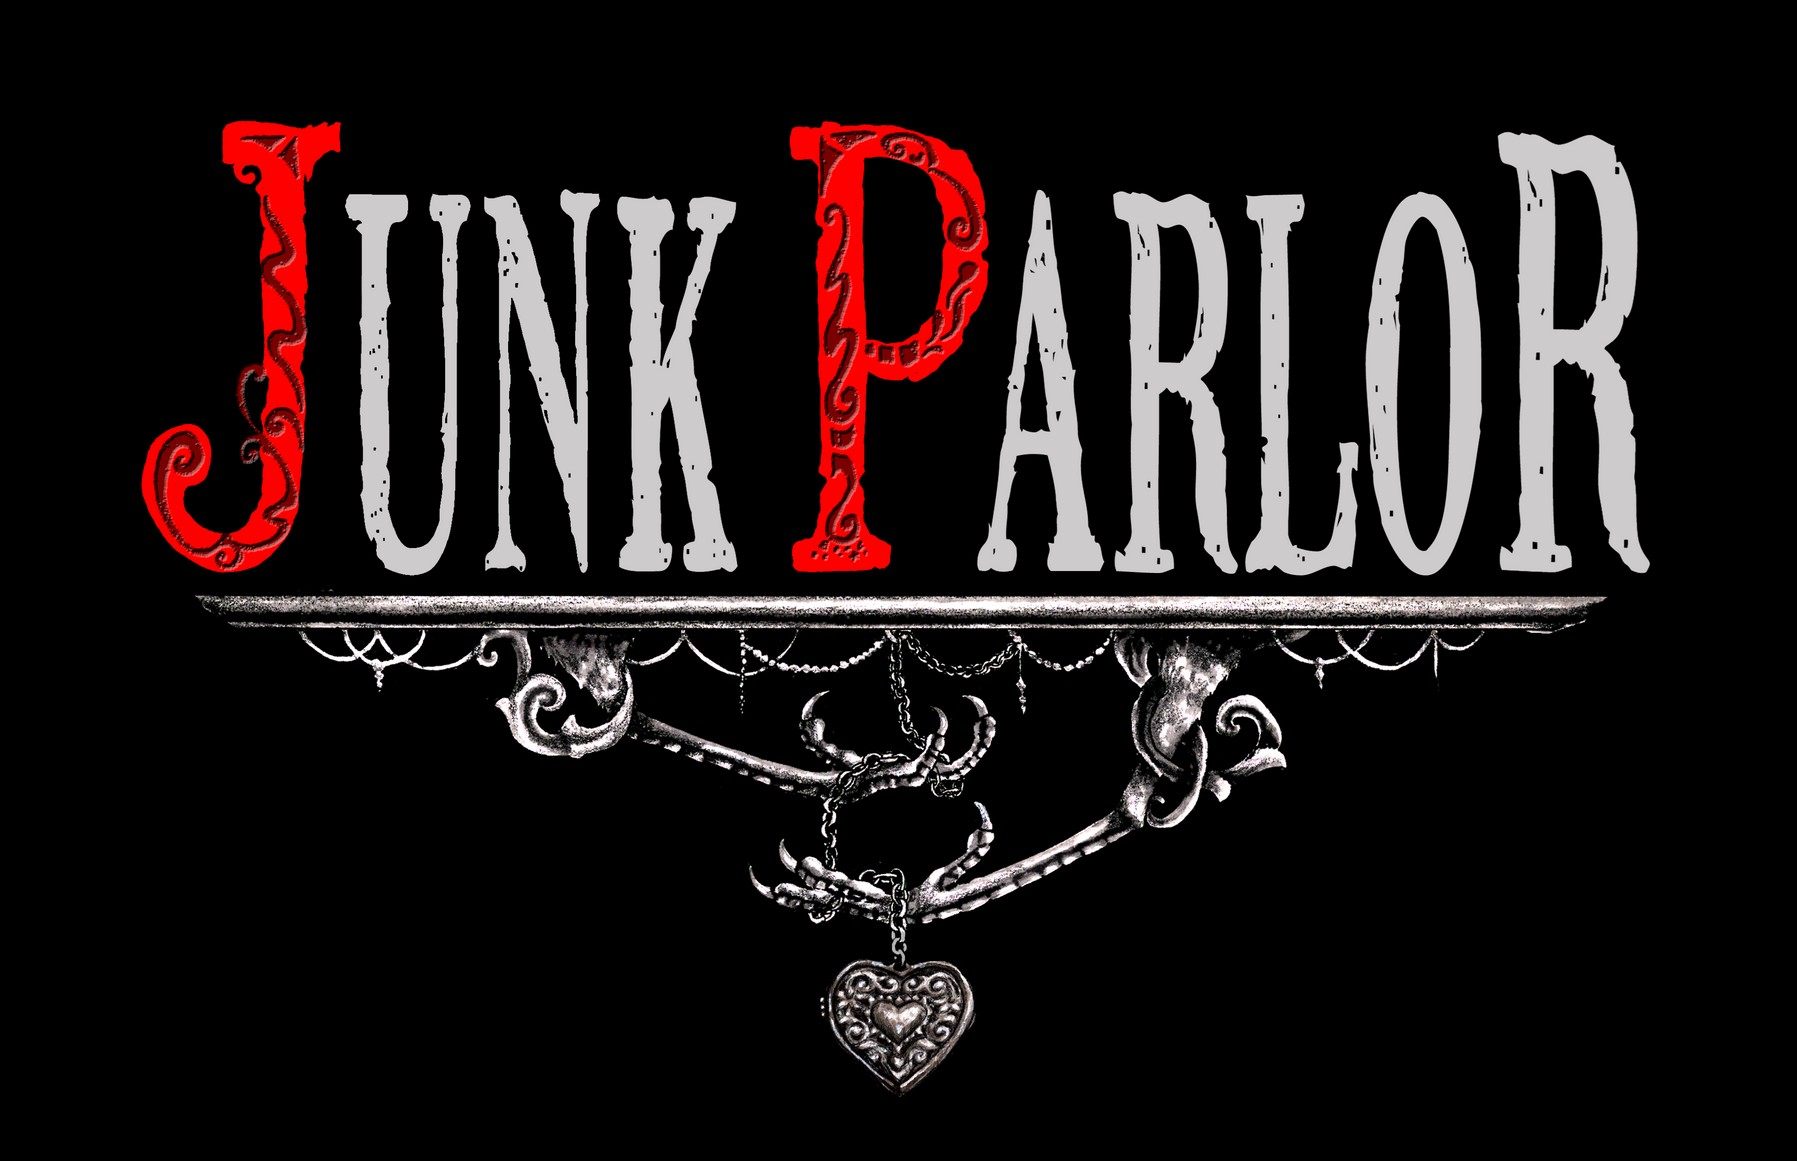 Junk Parlor band logo alt version